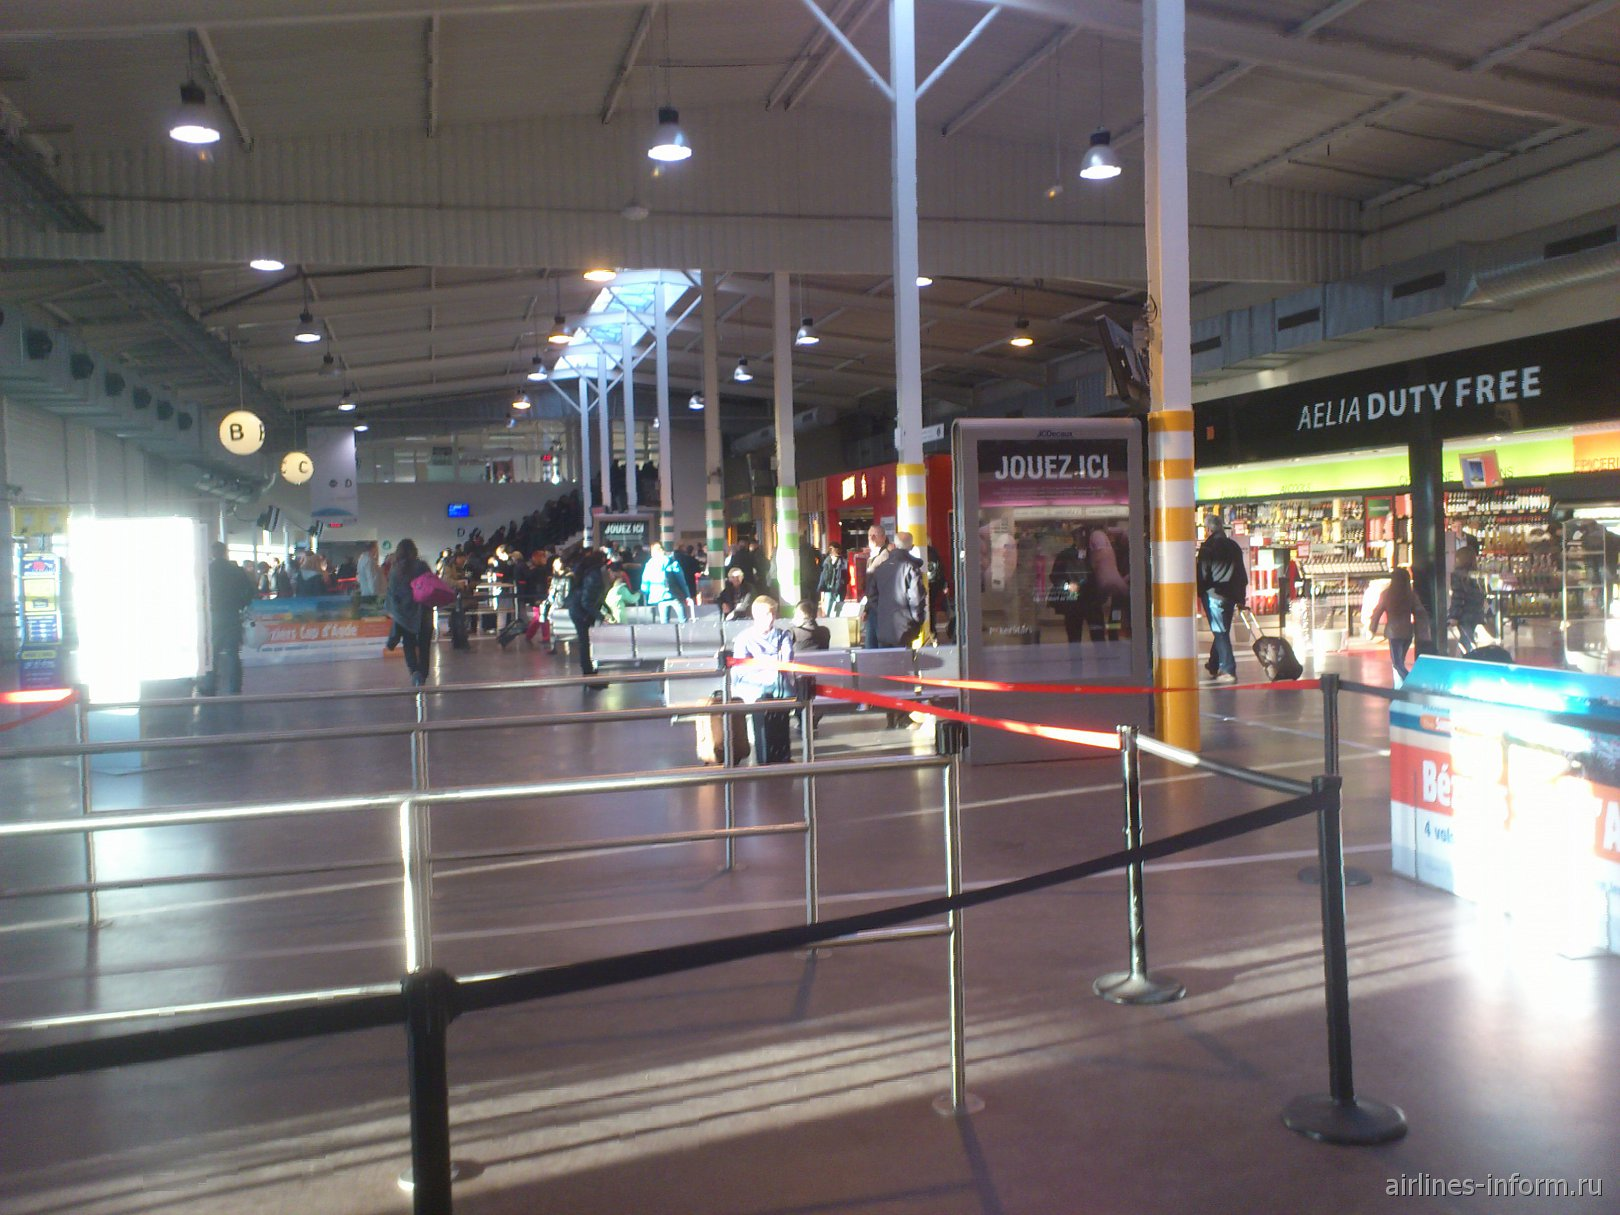 Зал ожидания с выходами на посадку в Терминале 2 аэропорта Париж Бове